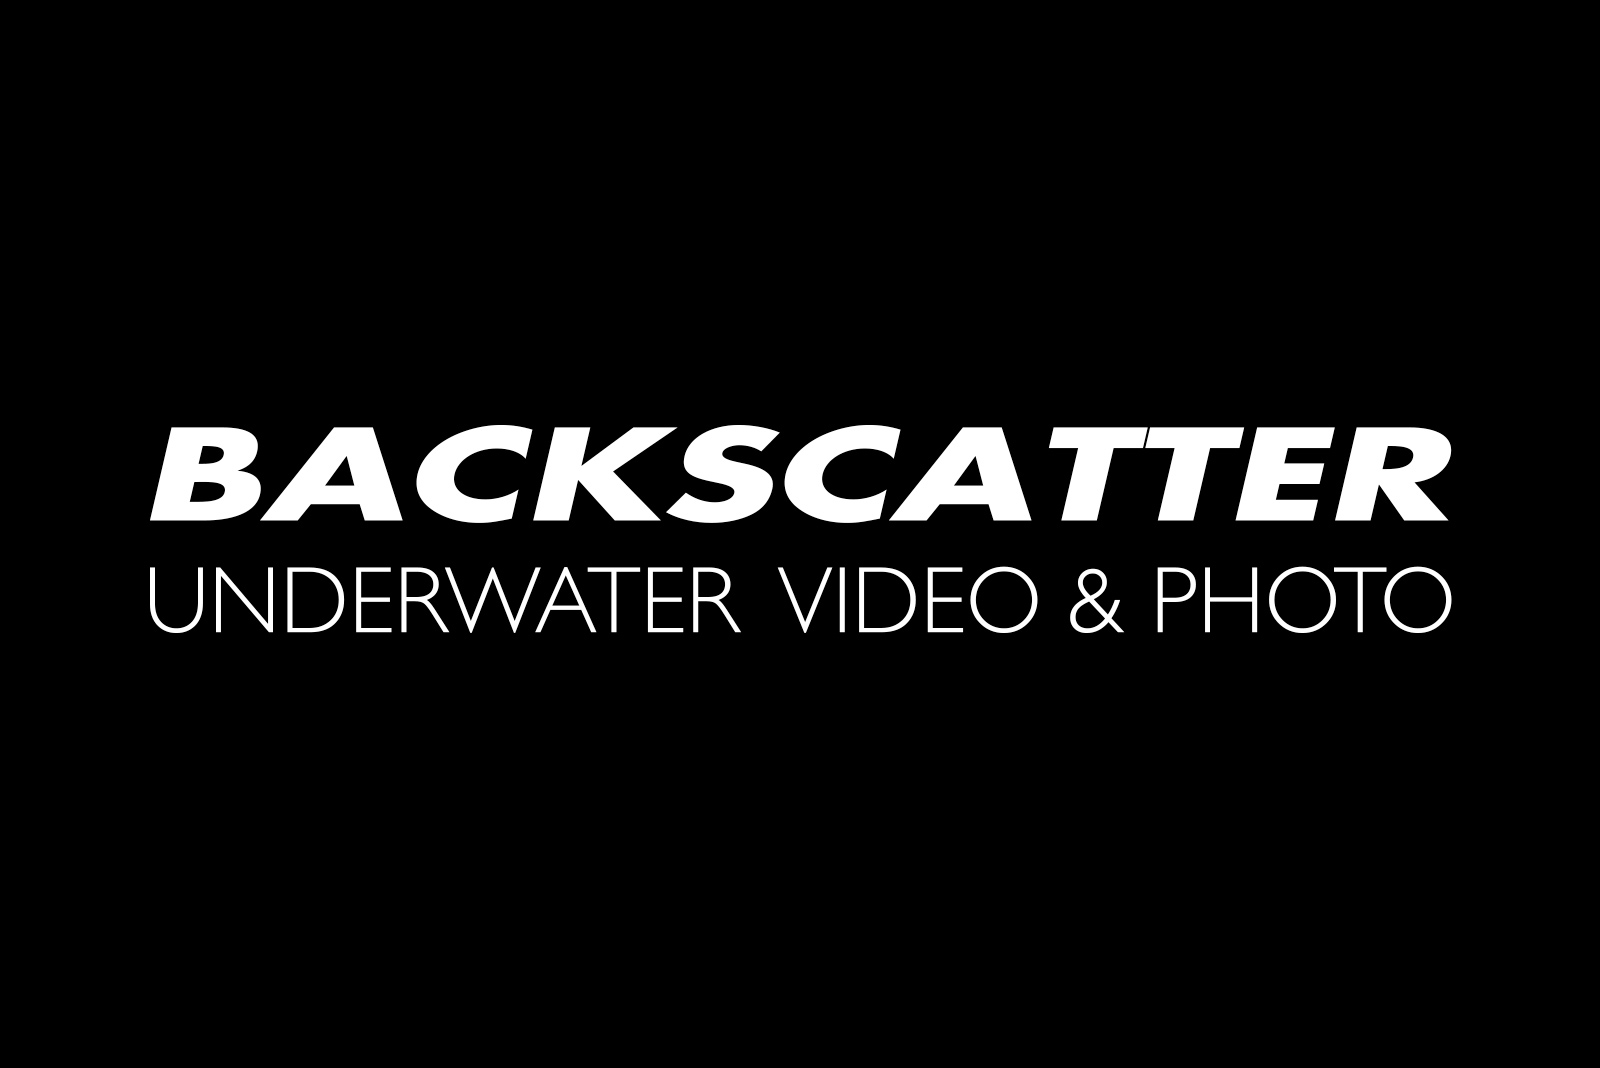 43a91c56210 Backscatter Shipping Policy - Backscatter